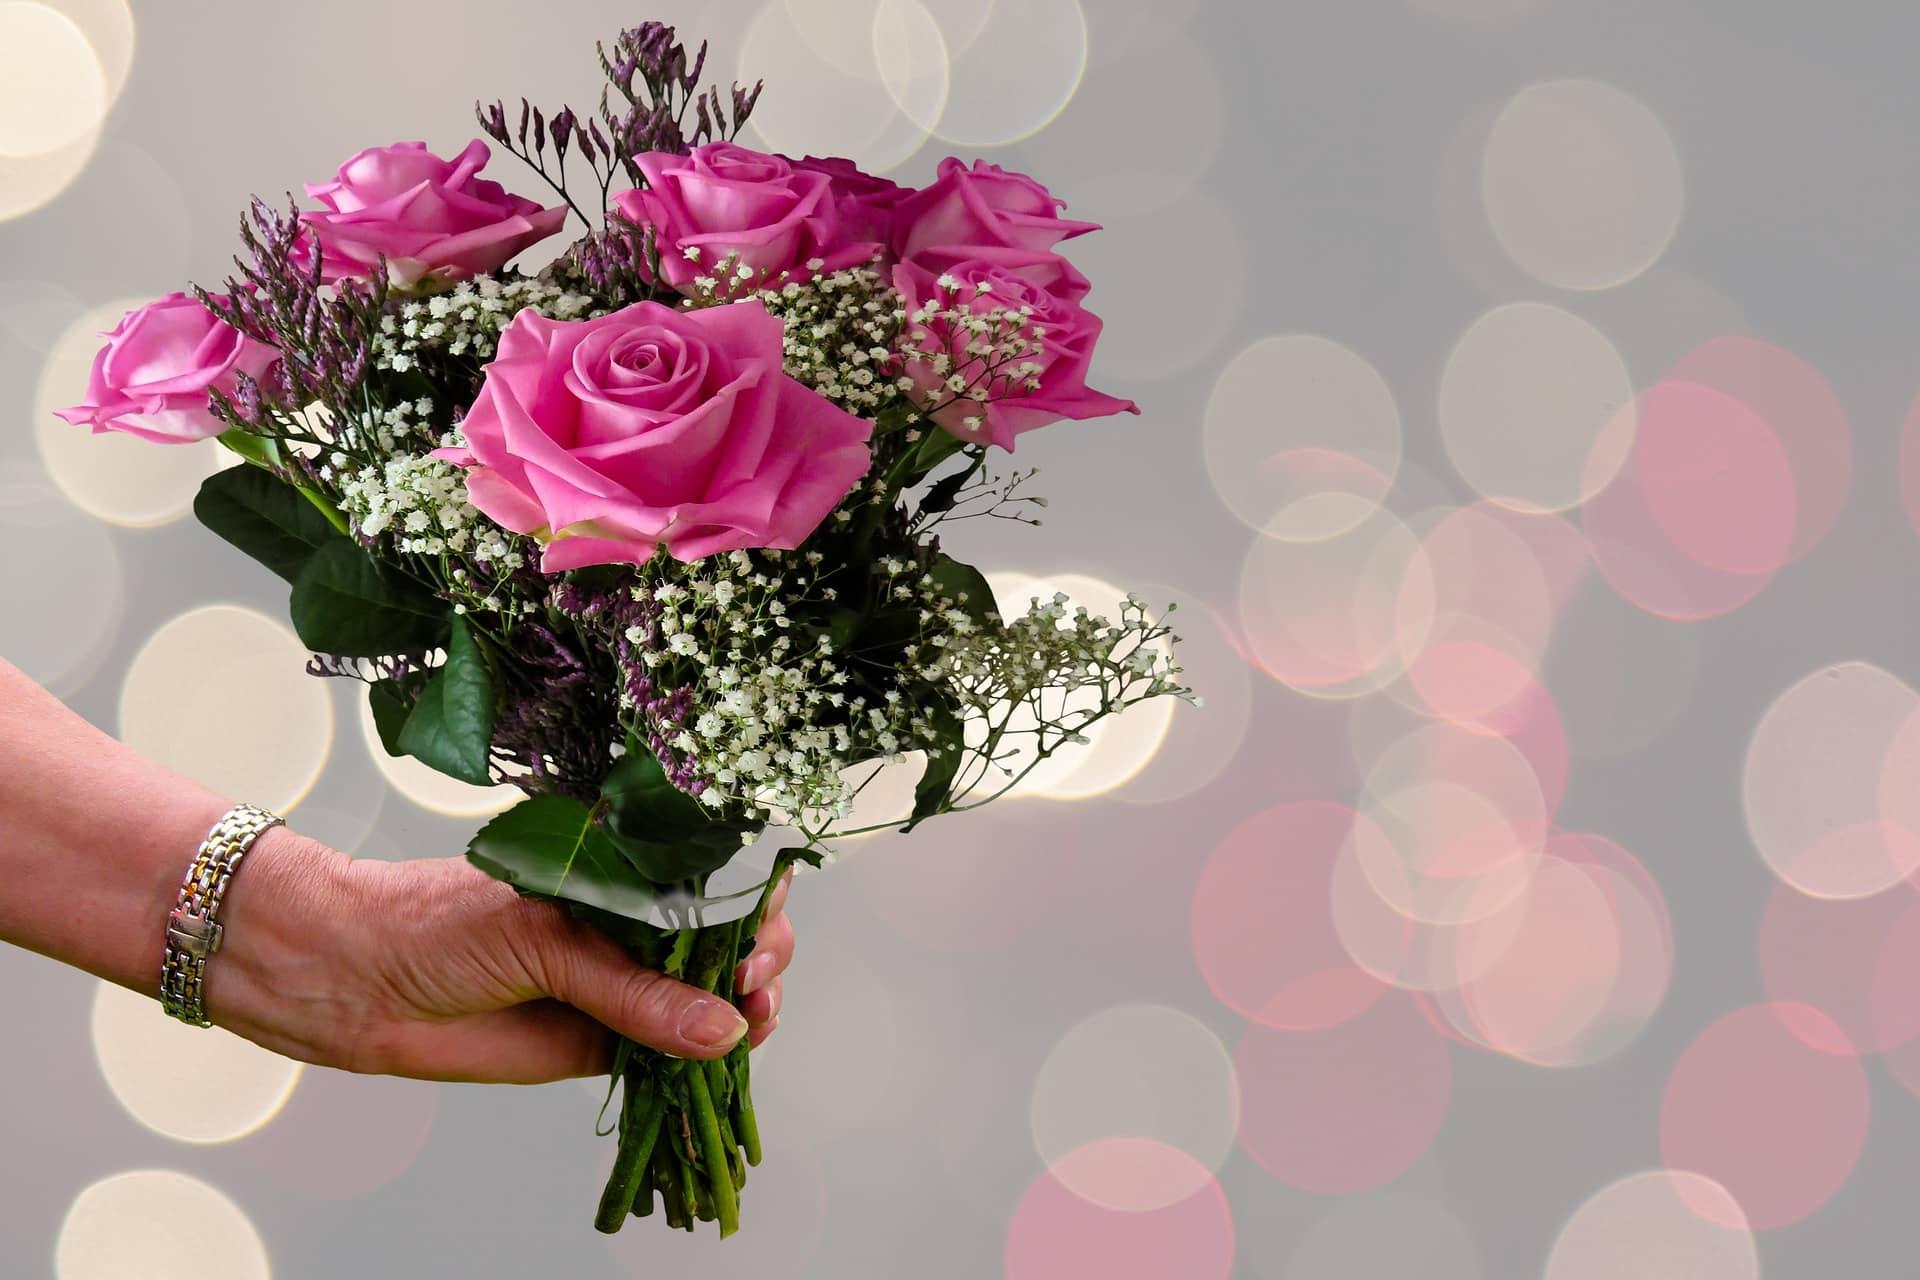 flowers 2199248 1920 1